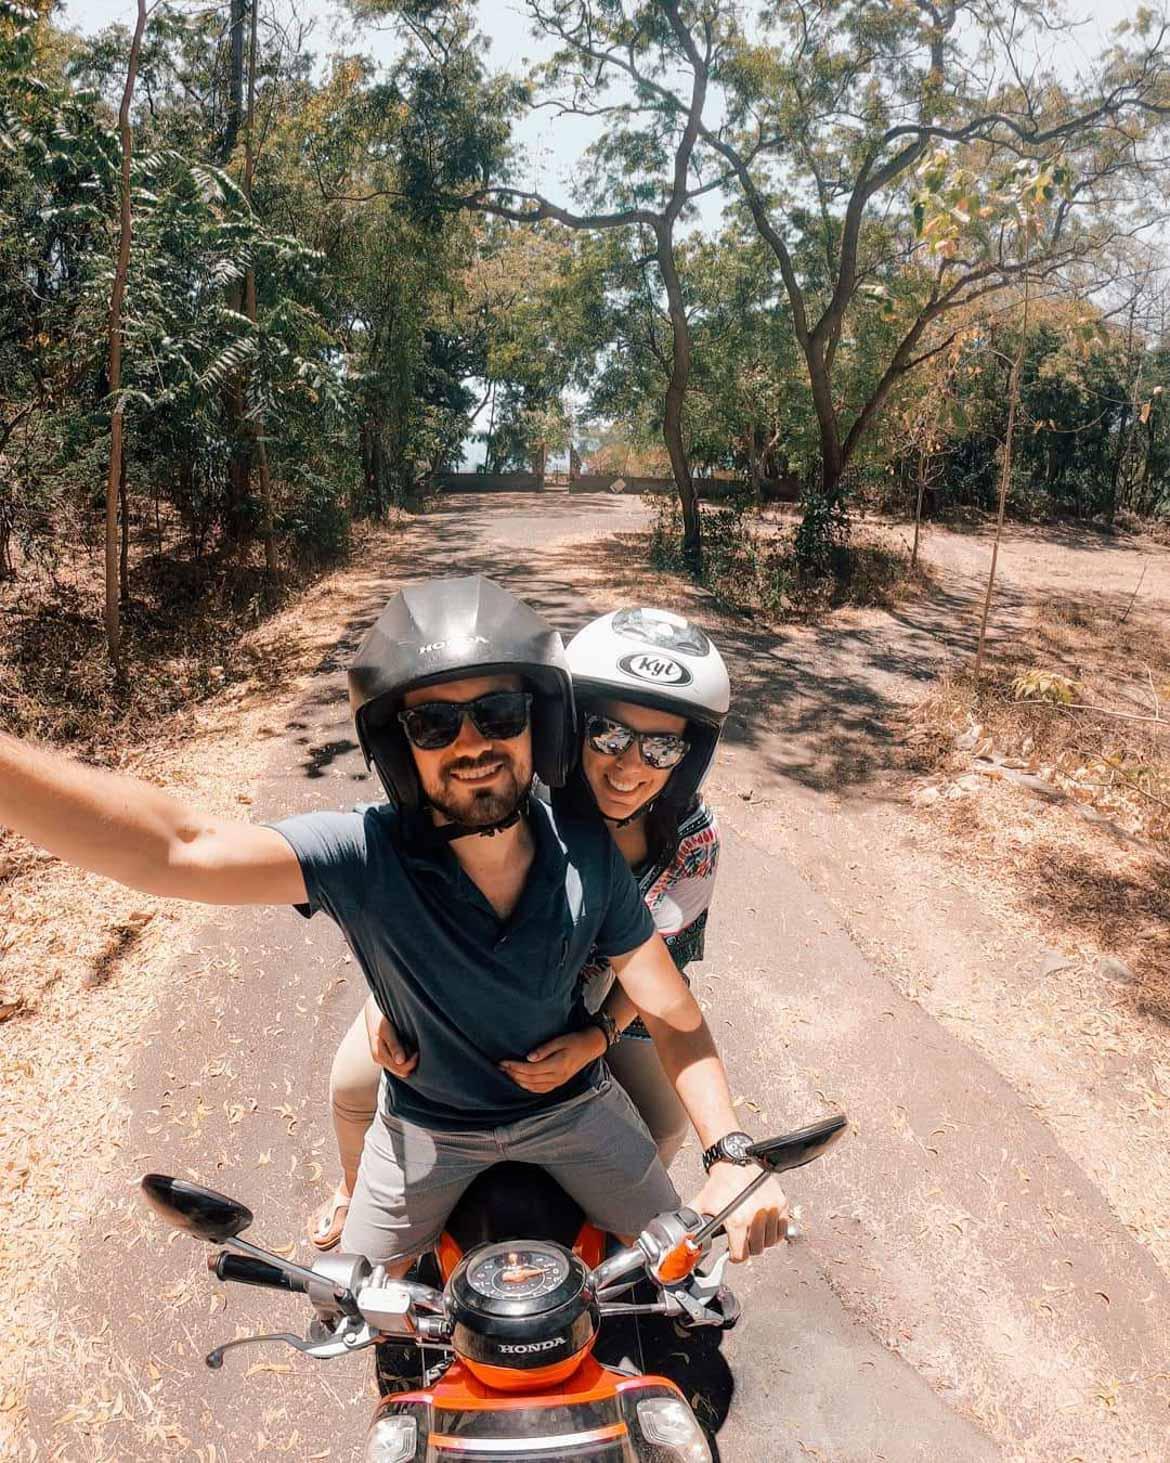 Spostarsi in scooter a Bali